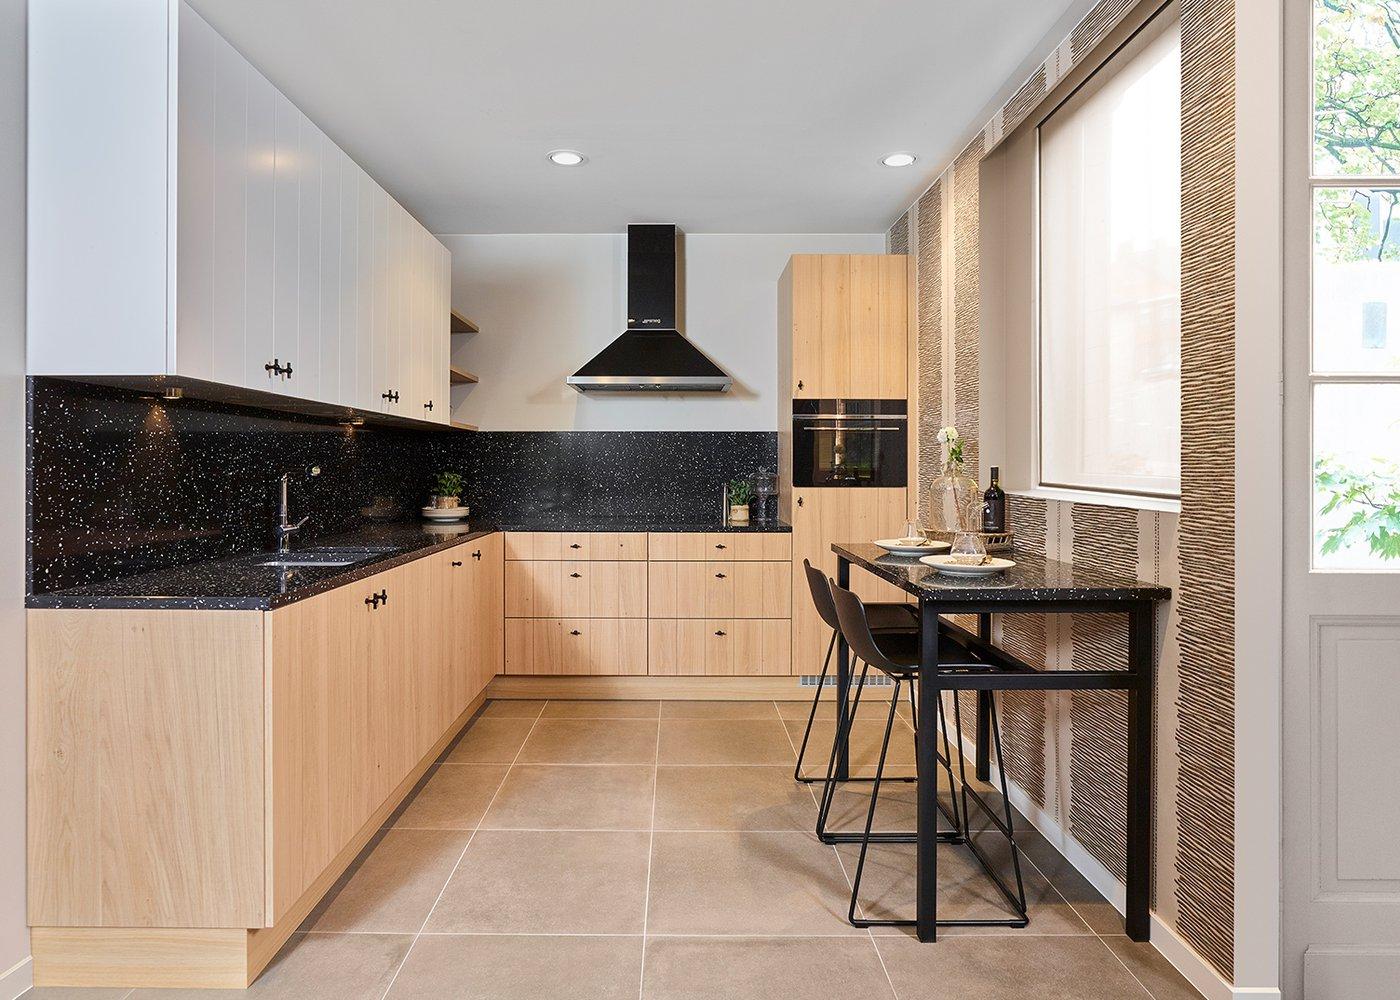 Landelijke keuken in fineer eik - Model Geneve